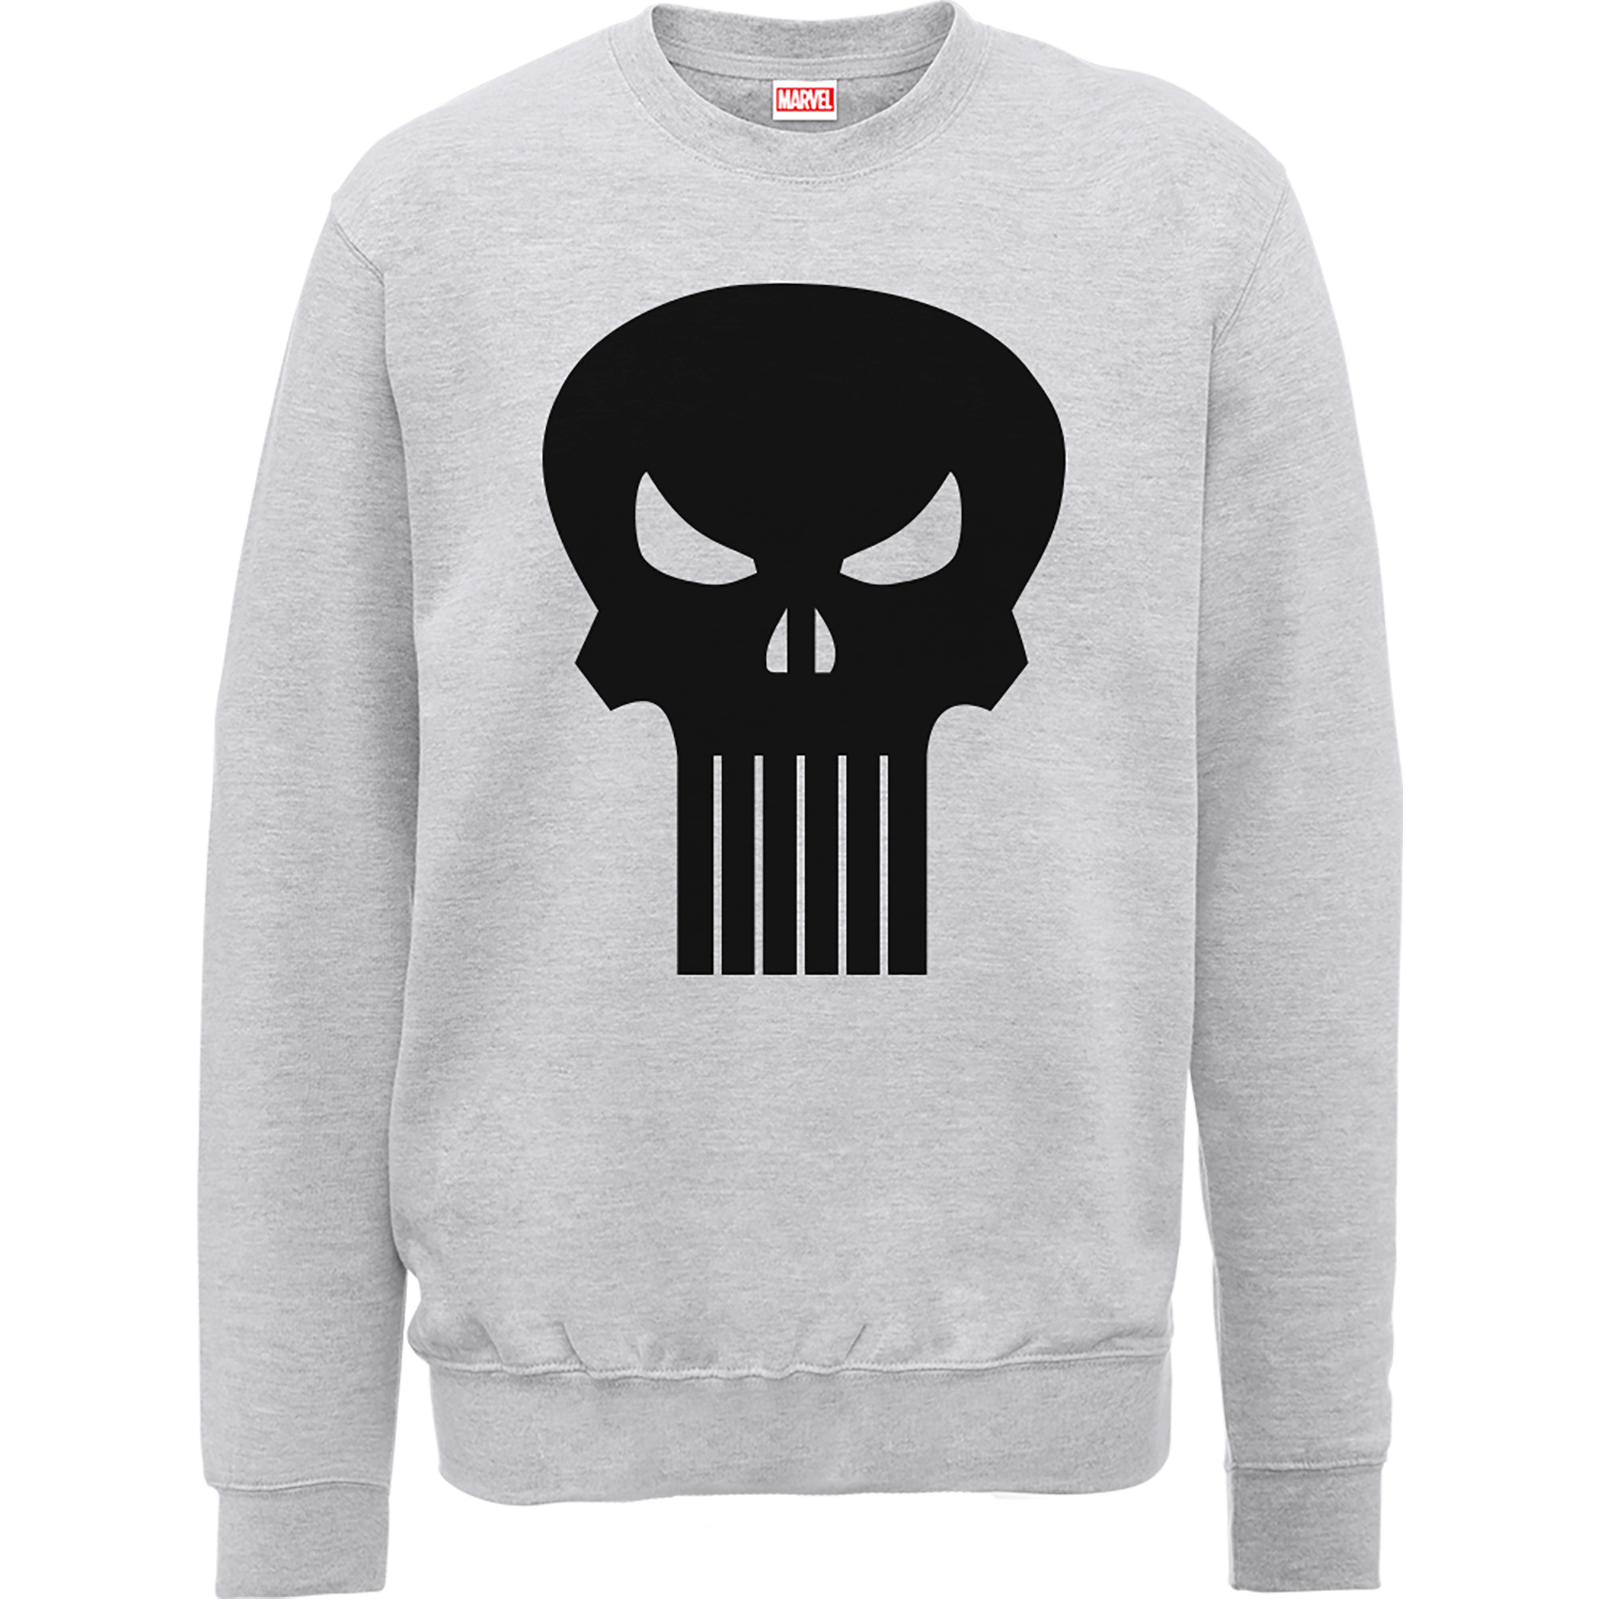 0b36c81454d3d1 Marvel The Punisher Skull Logo Grey Men's Sweatshirt Clothing | Zavvi